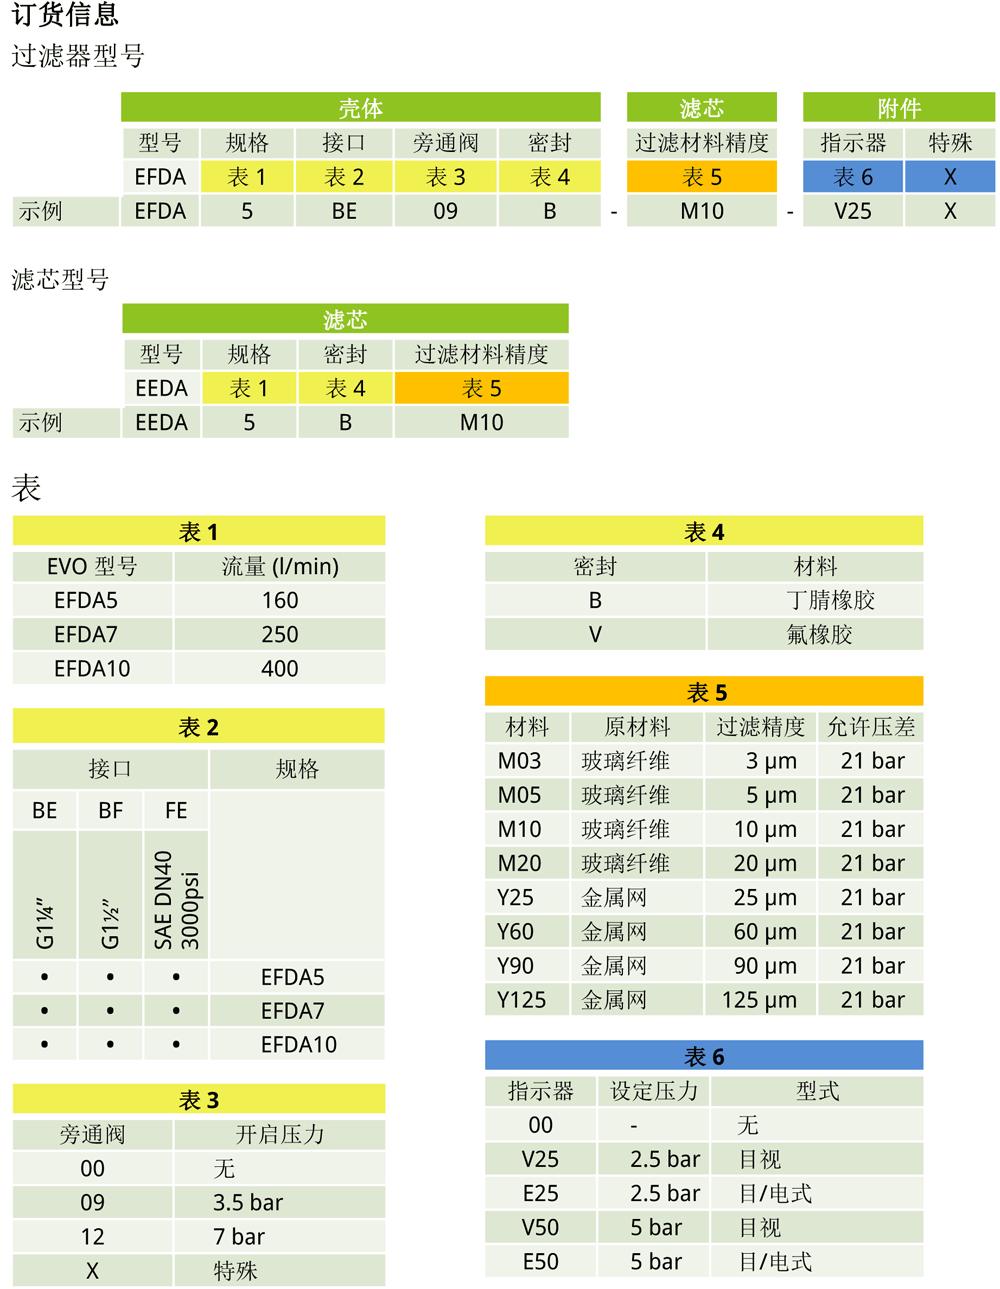 EFDA双筒过滤器订单信息